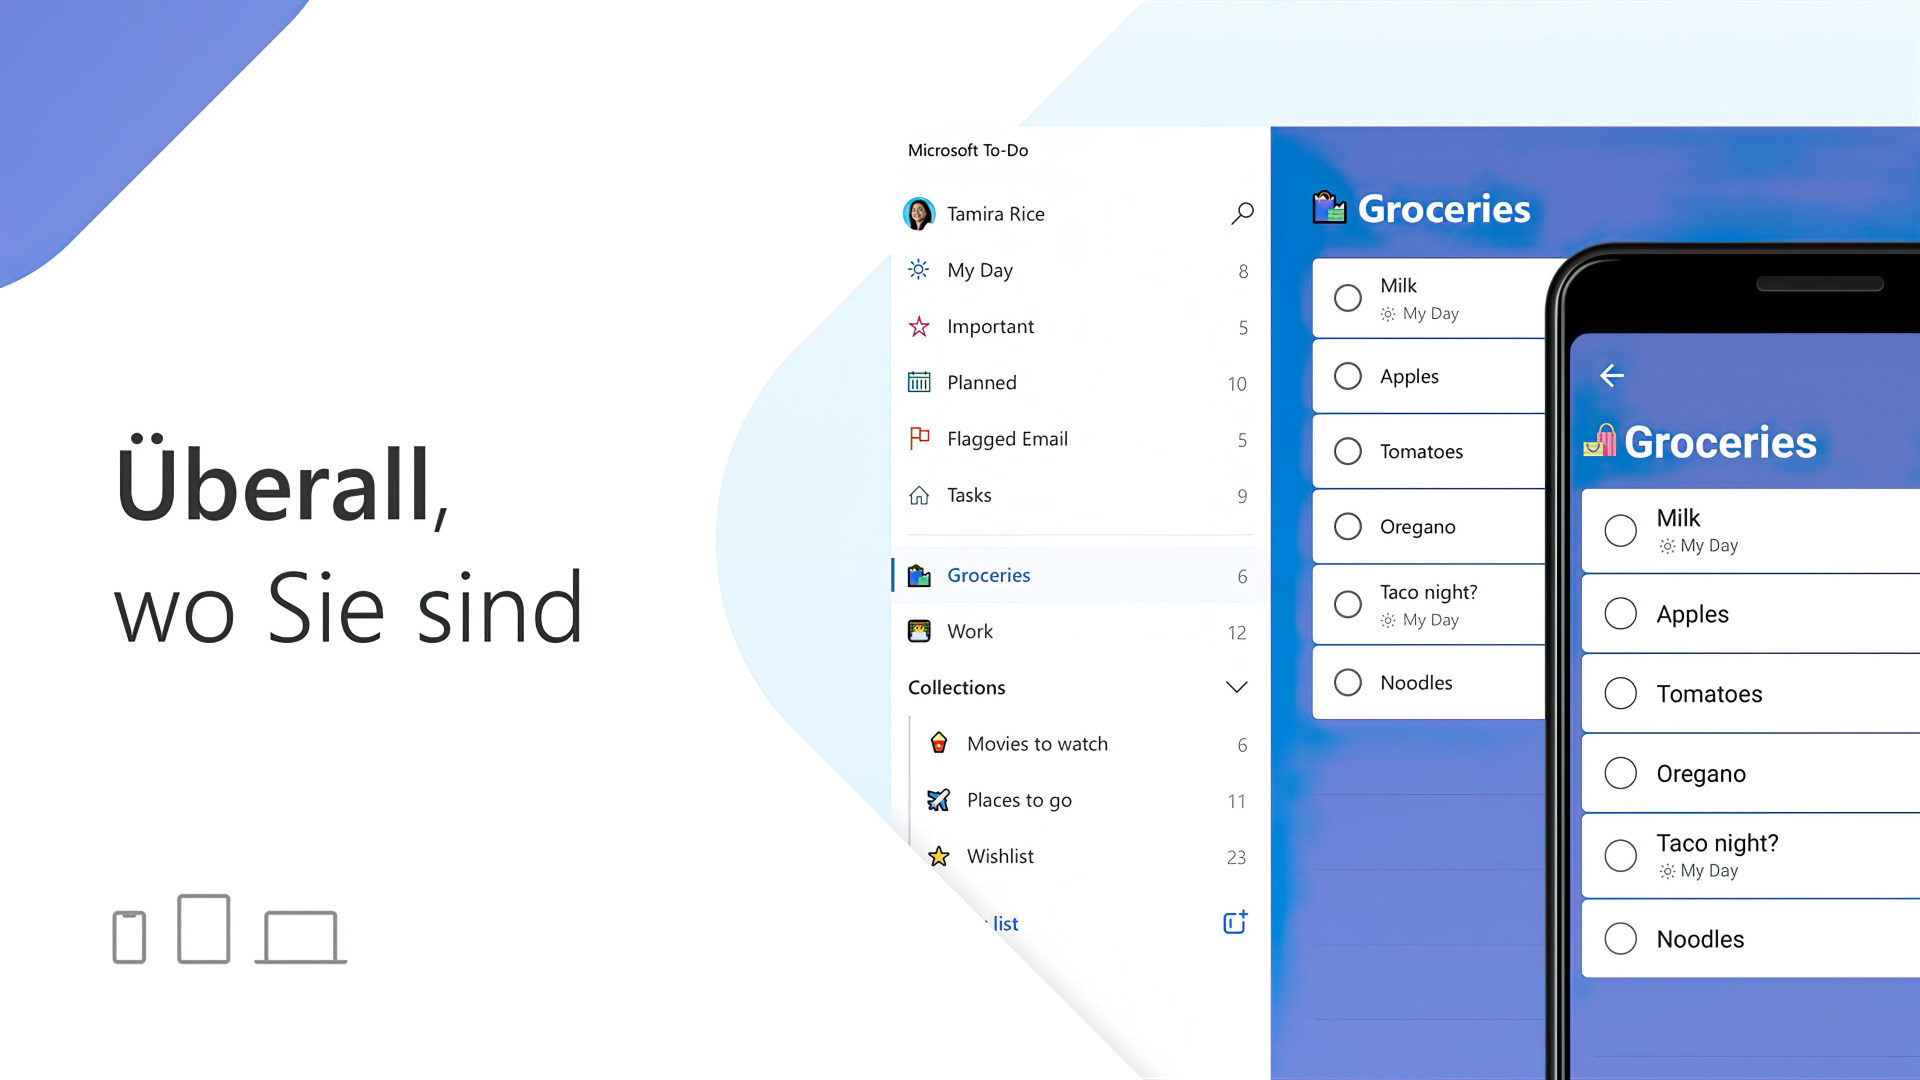 Microsoft, Aufgaben, To-Do, Microsoft To-Do